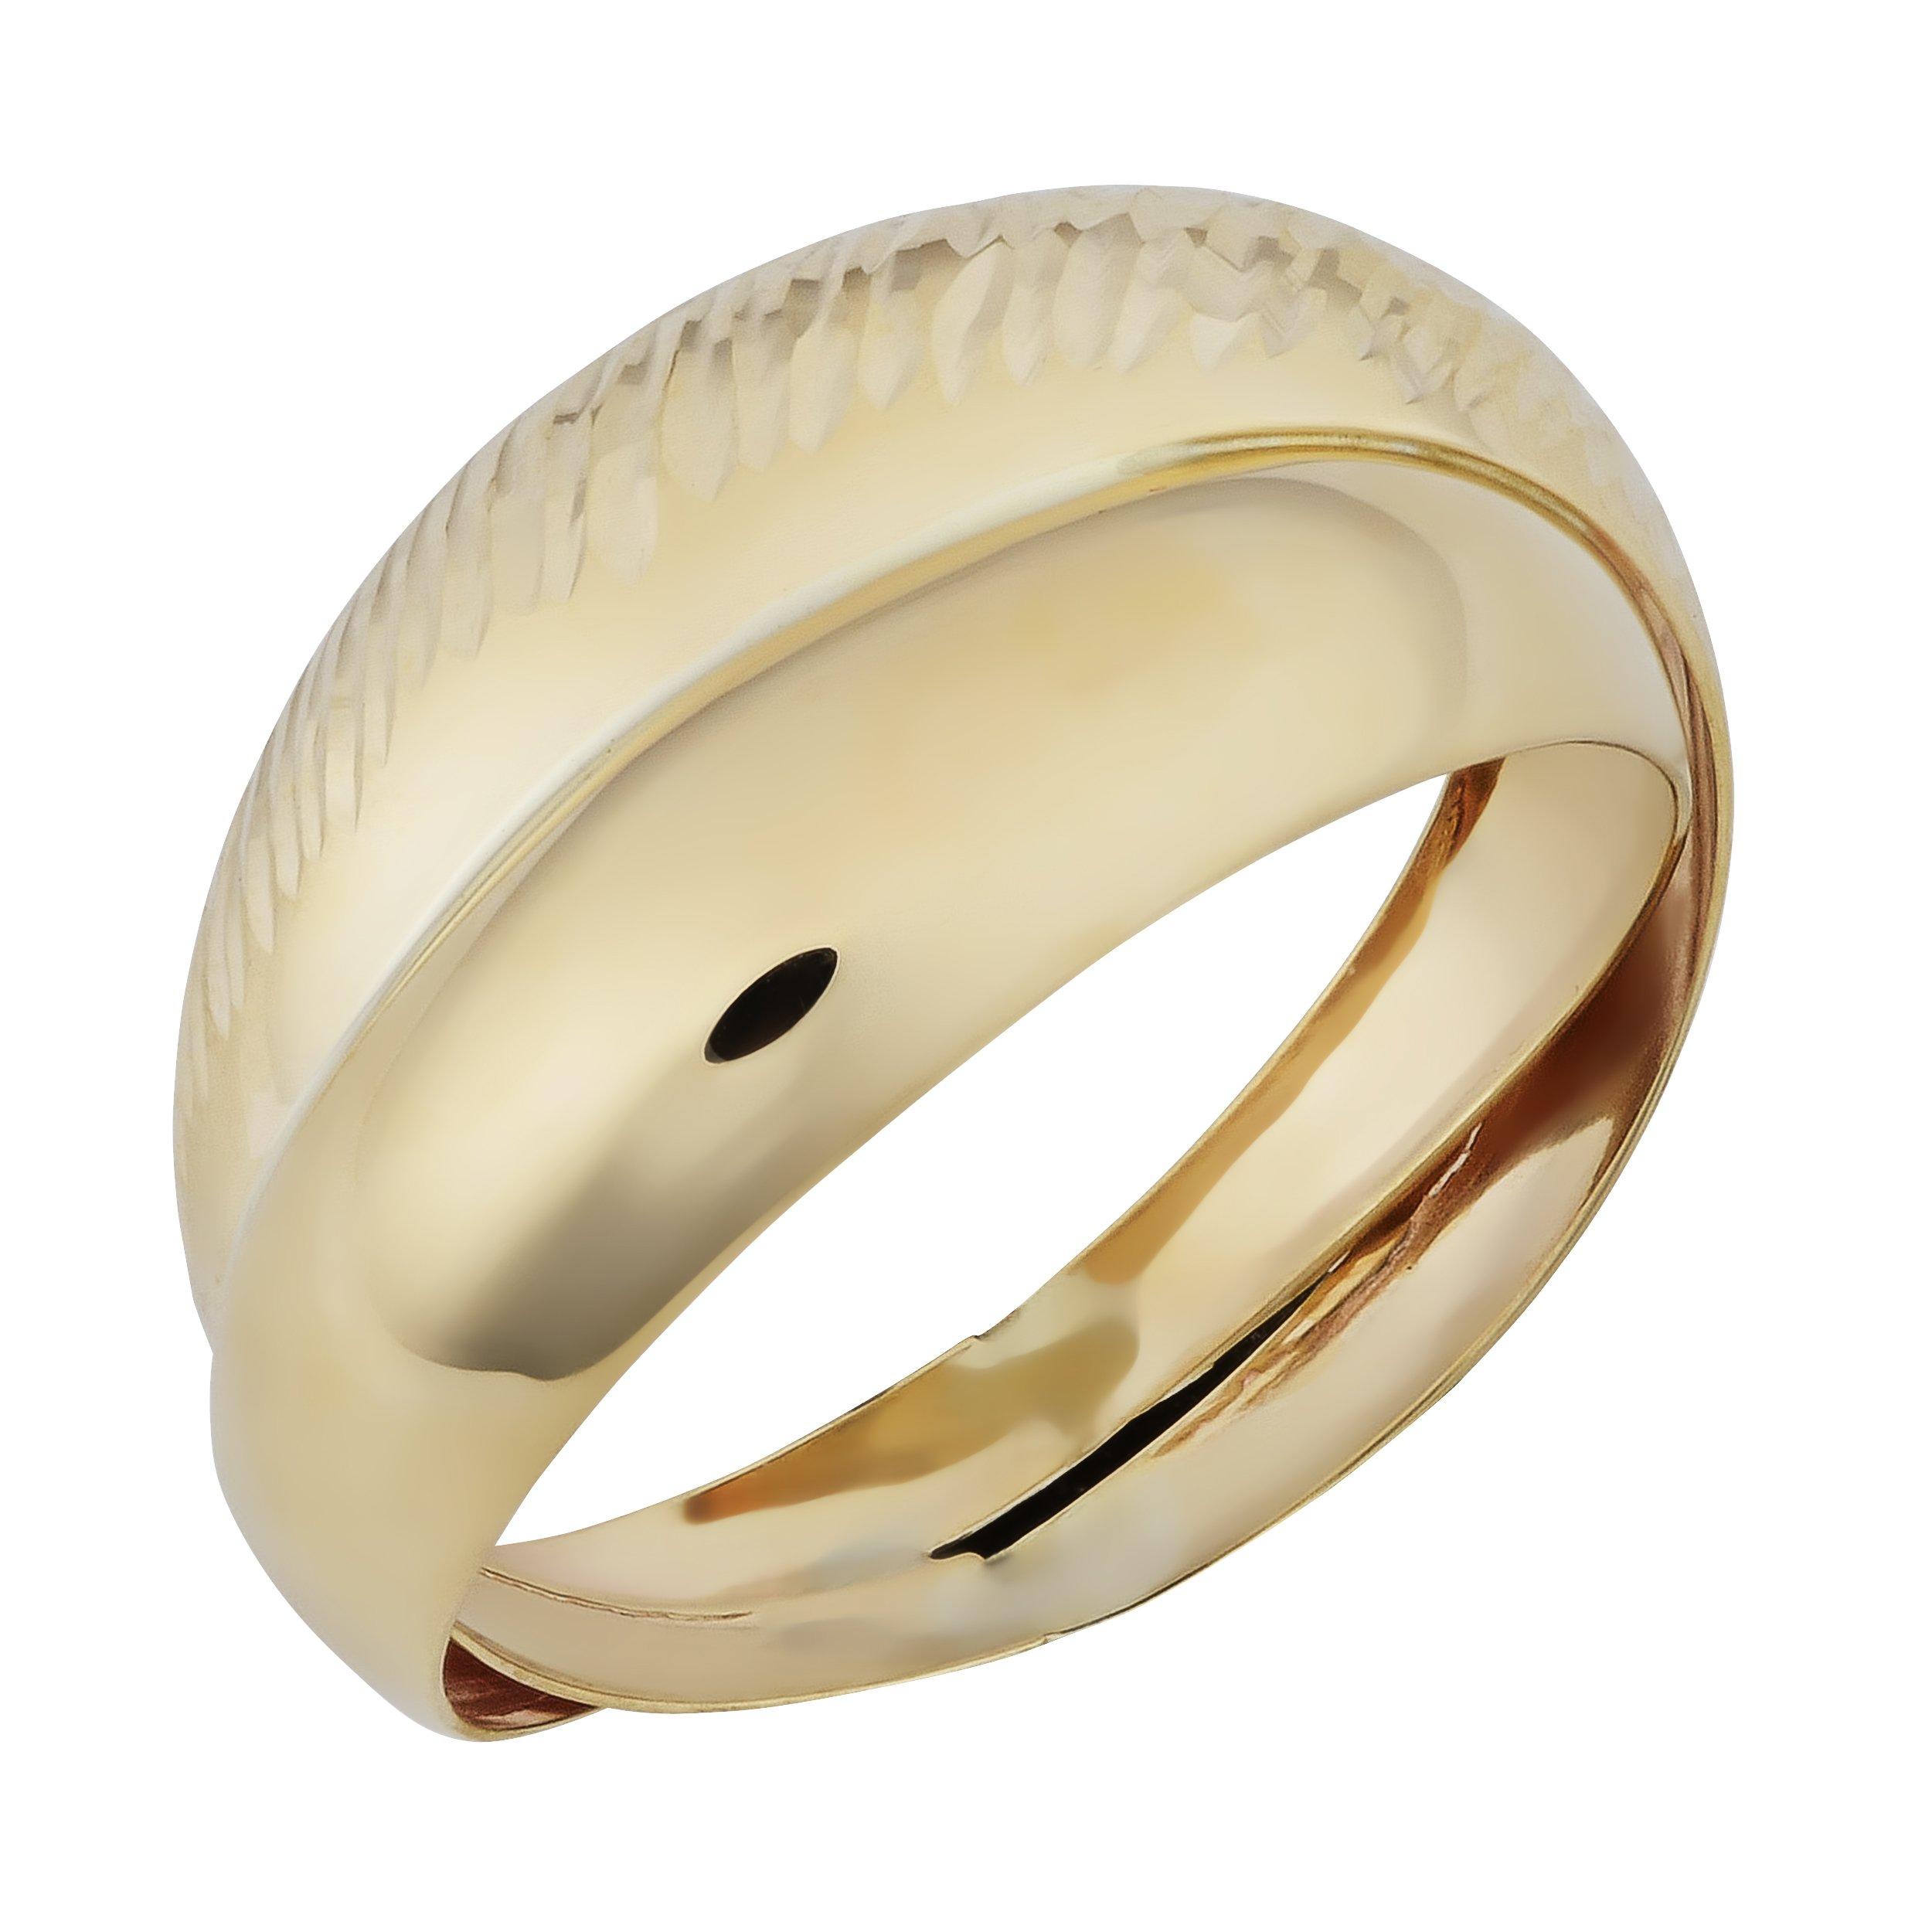 Kooljewelry 10k Yellow Gold Diamond-cut and Polished Double Band Ring (size 7)